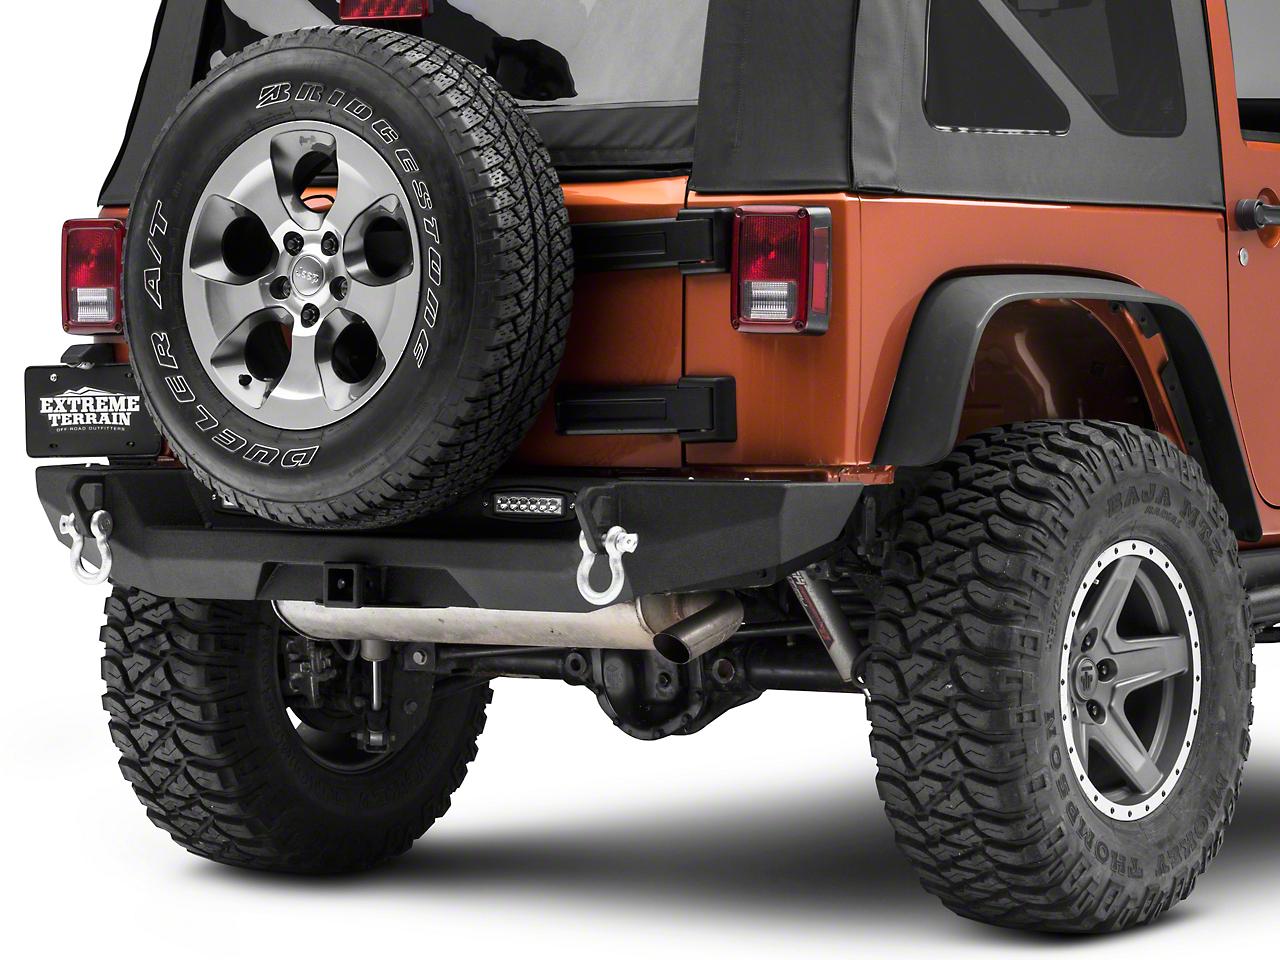 RedRock 4x4 Max-HD Rear Bumper w/ LED Fog Lights (07-18 Wrangler JK)